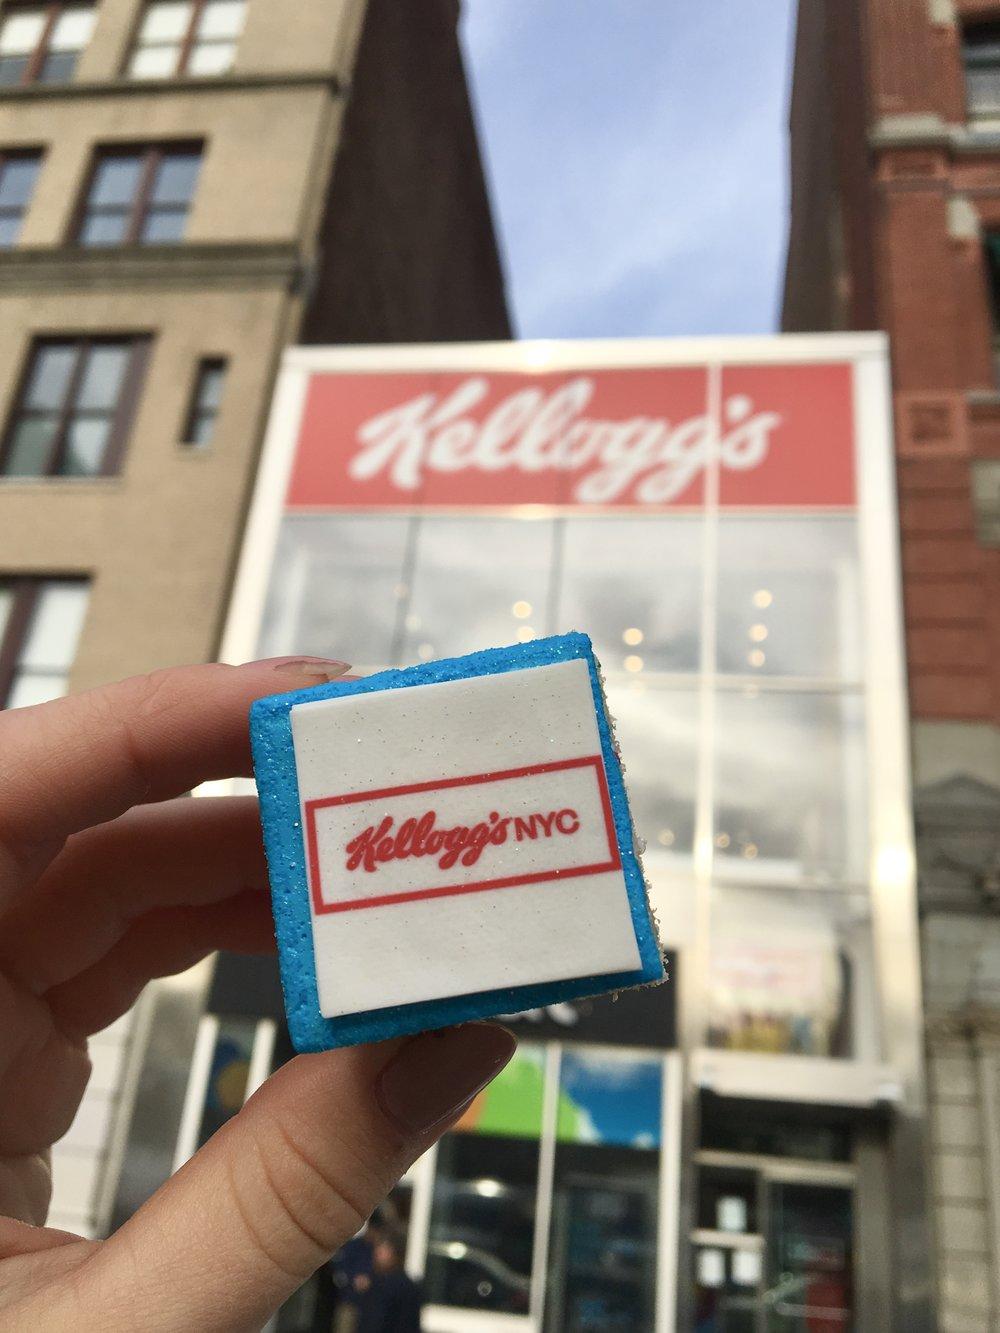 Custom Rice Krispies to welcome @KellogsNYC to the neighborhood!